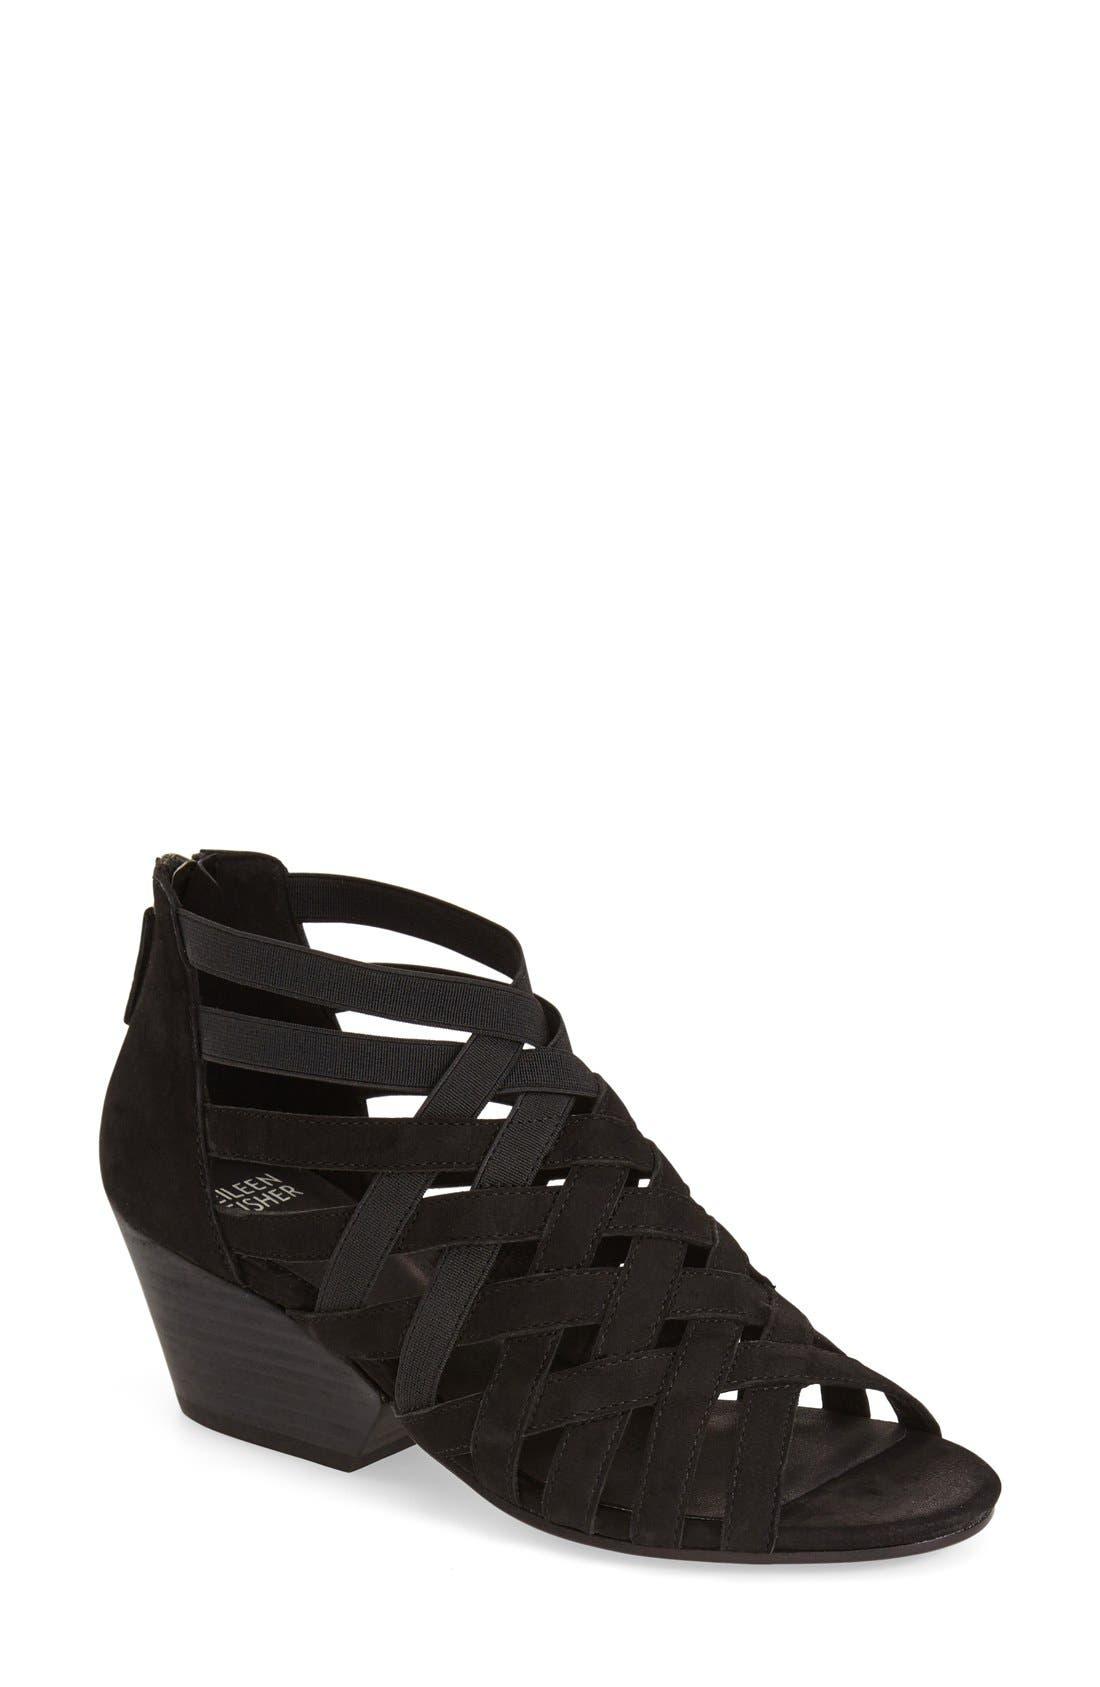 Oodle Sandal,                         Main,                         color, Black